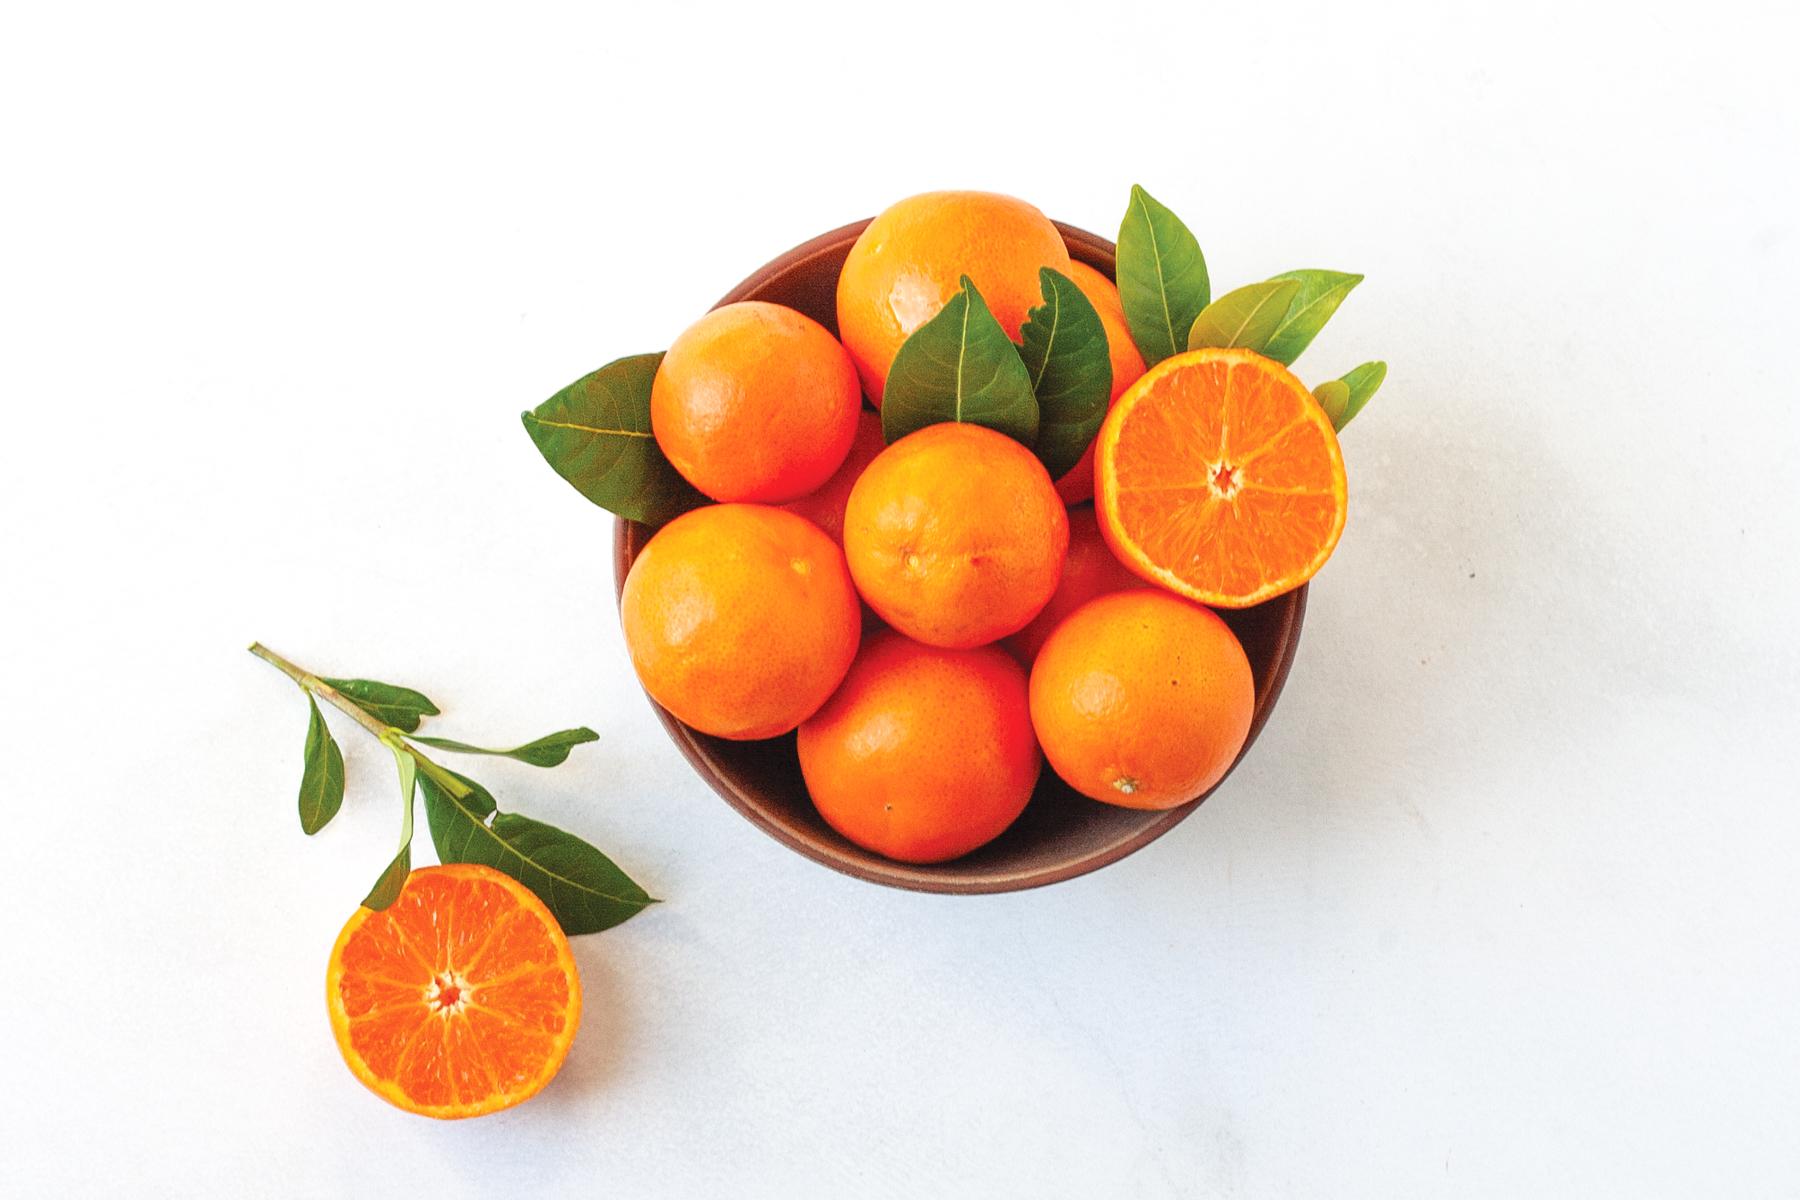 oranges as health benefit of fiber